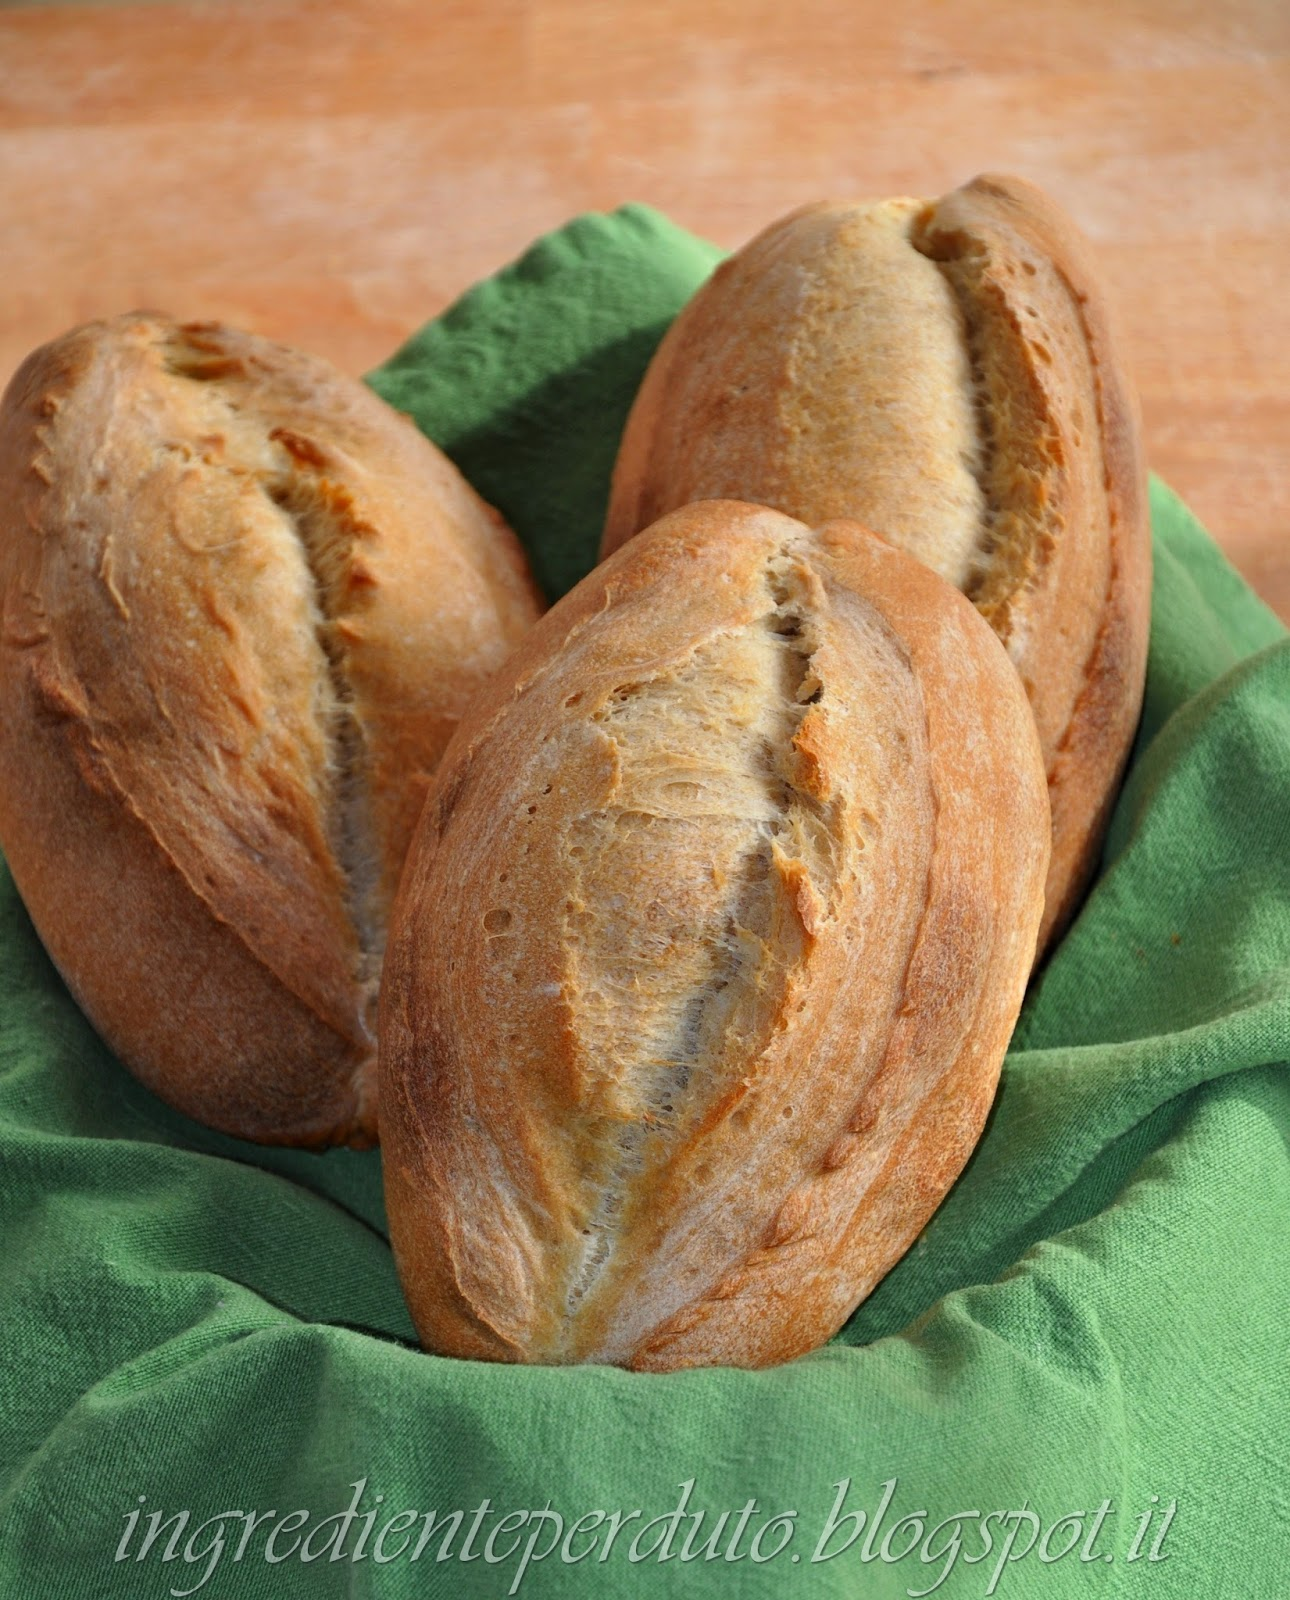 le boulot a lievitazione naturale, pane a pasta dura.